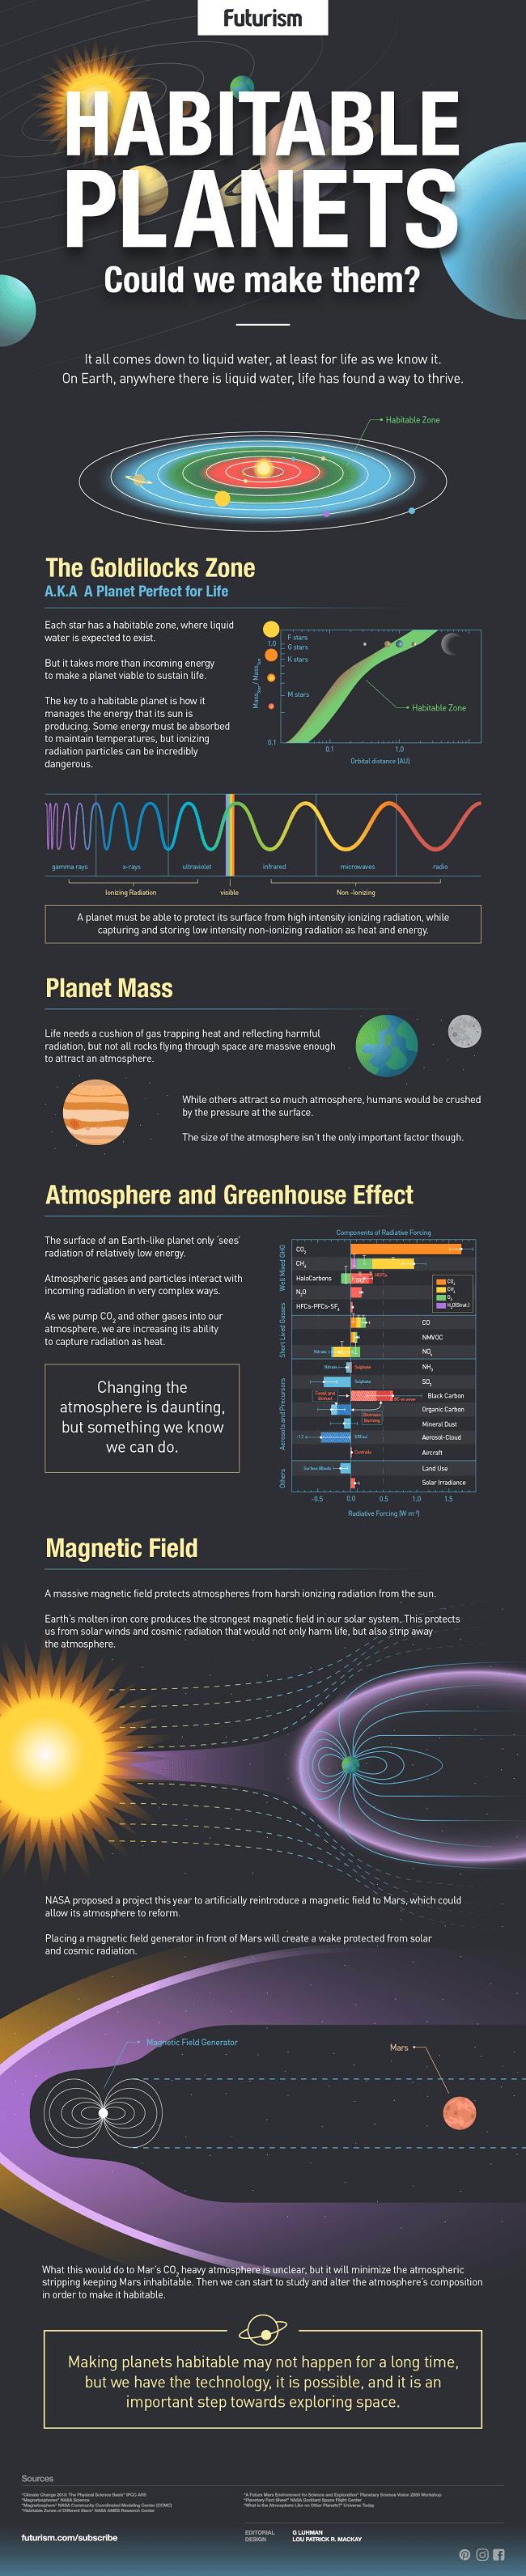 Habitable planets